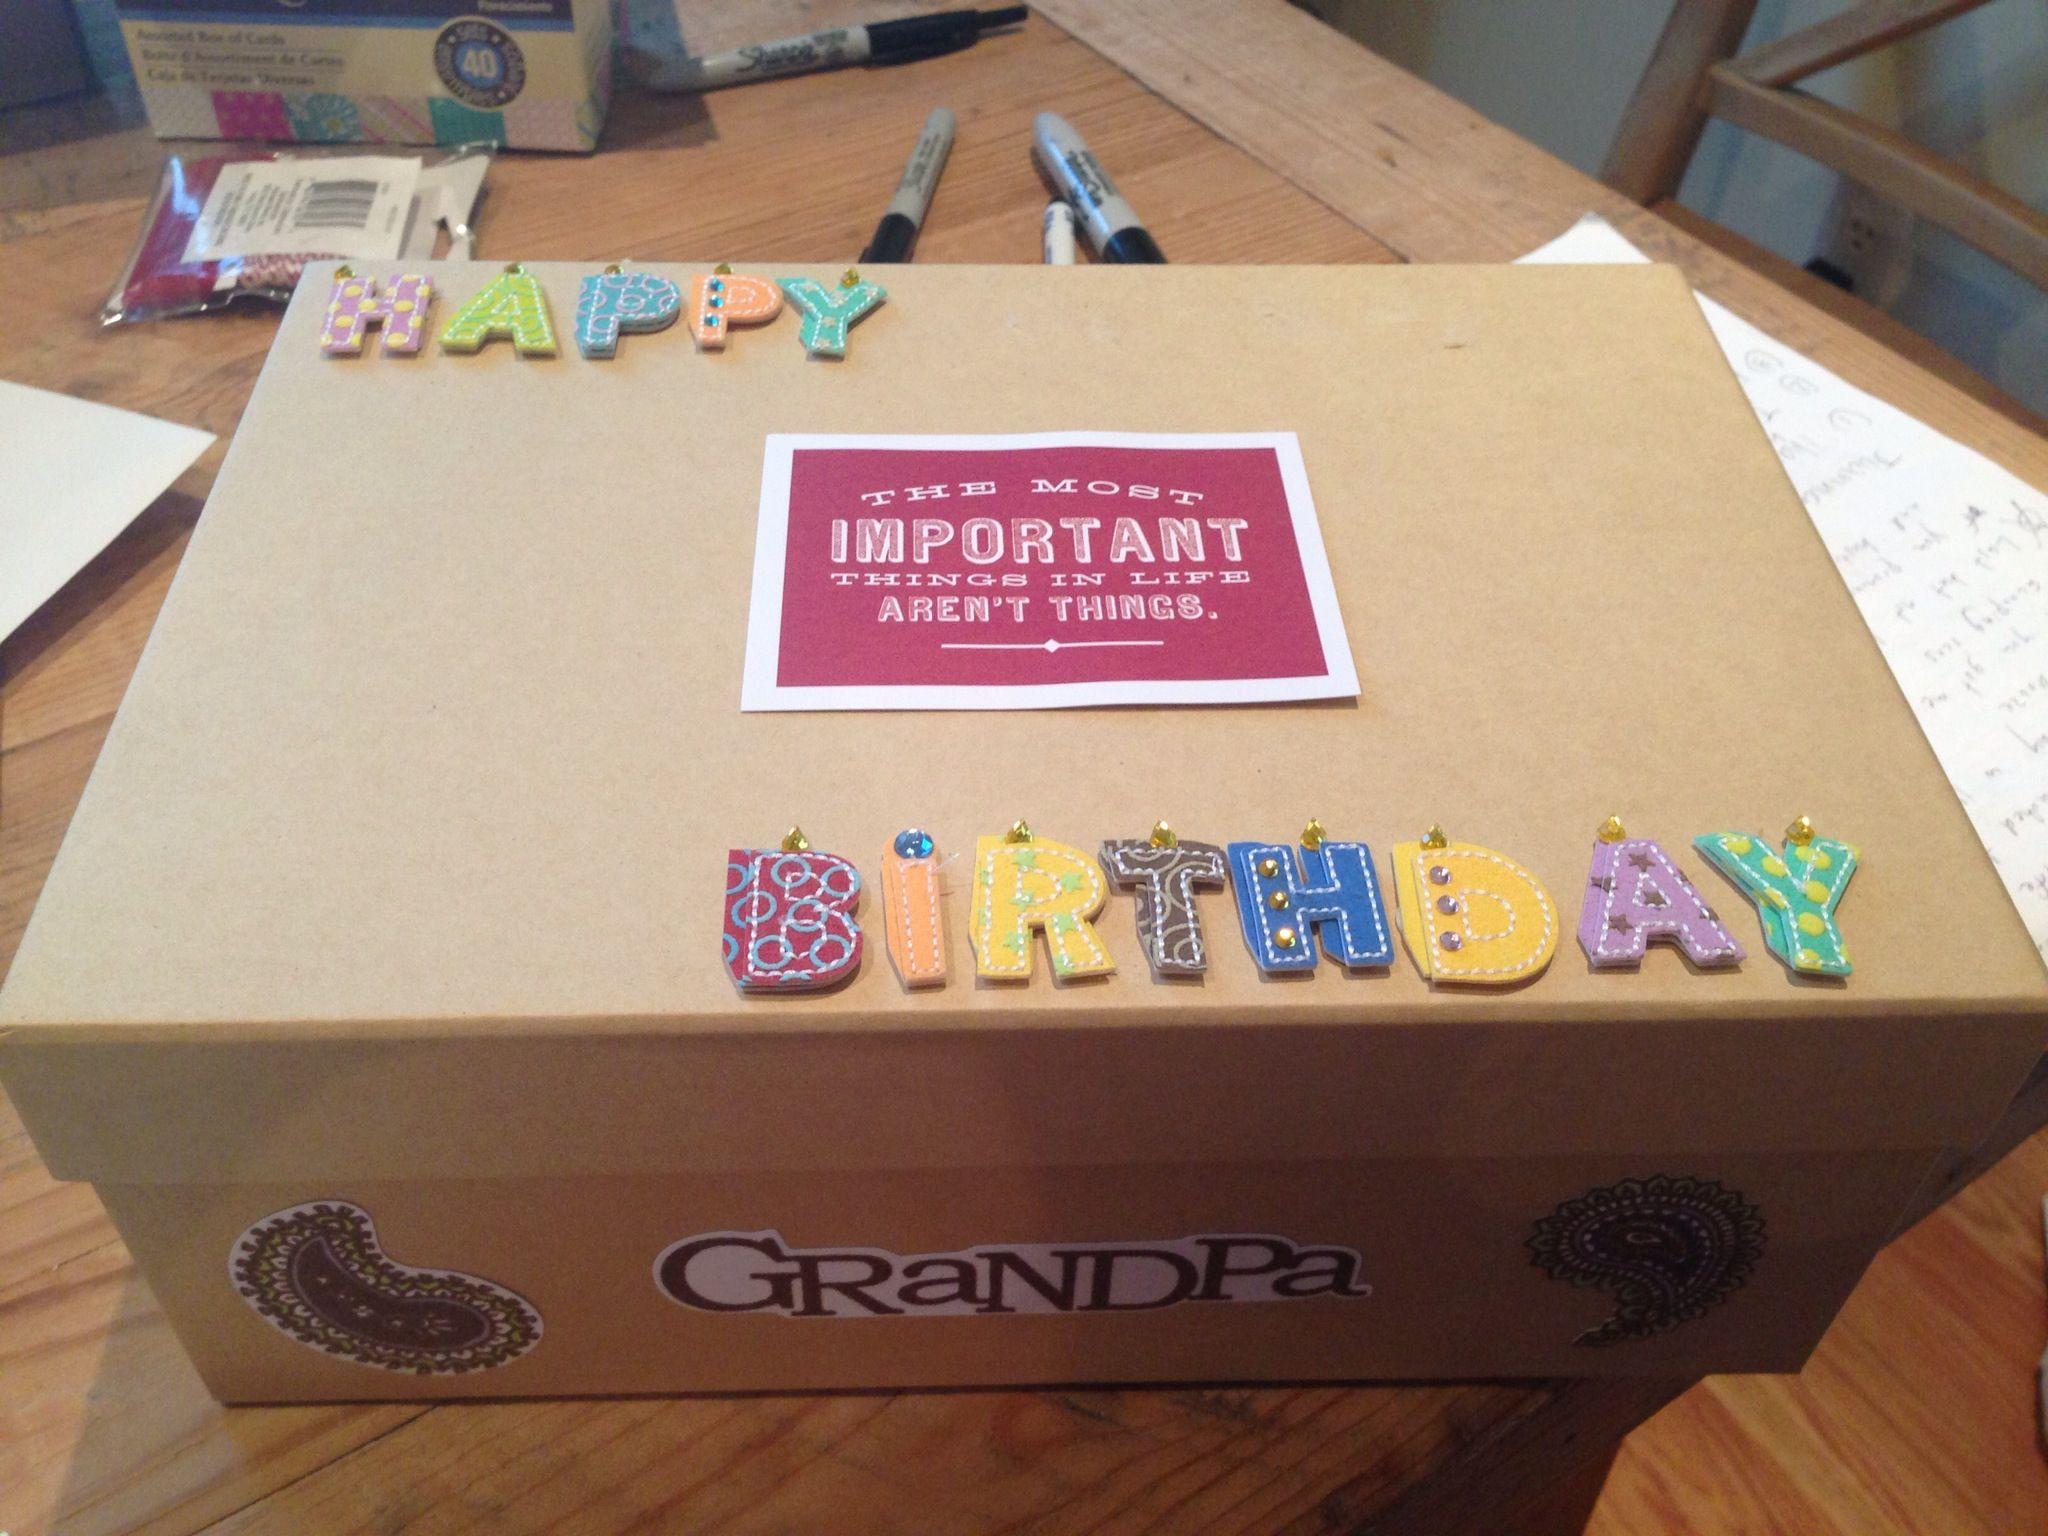 60th birthday box 60 years of memories in the box